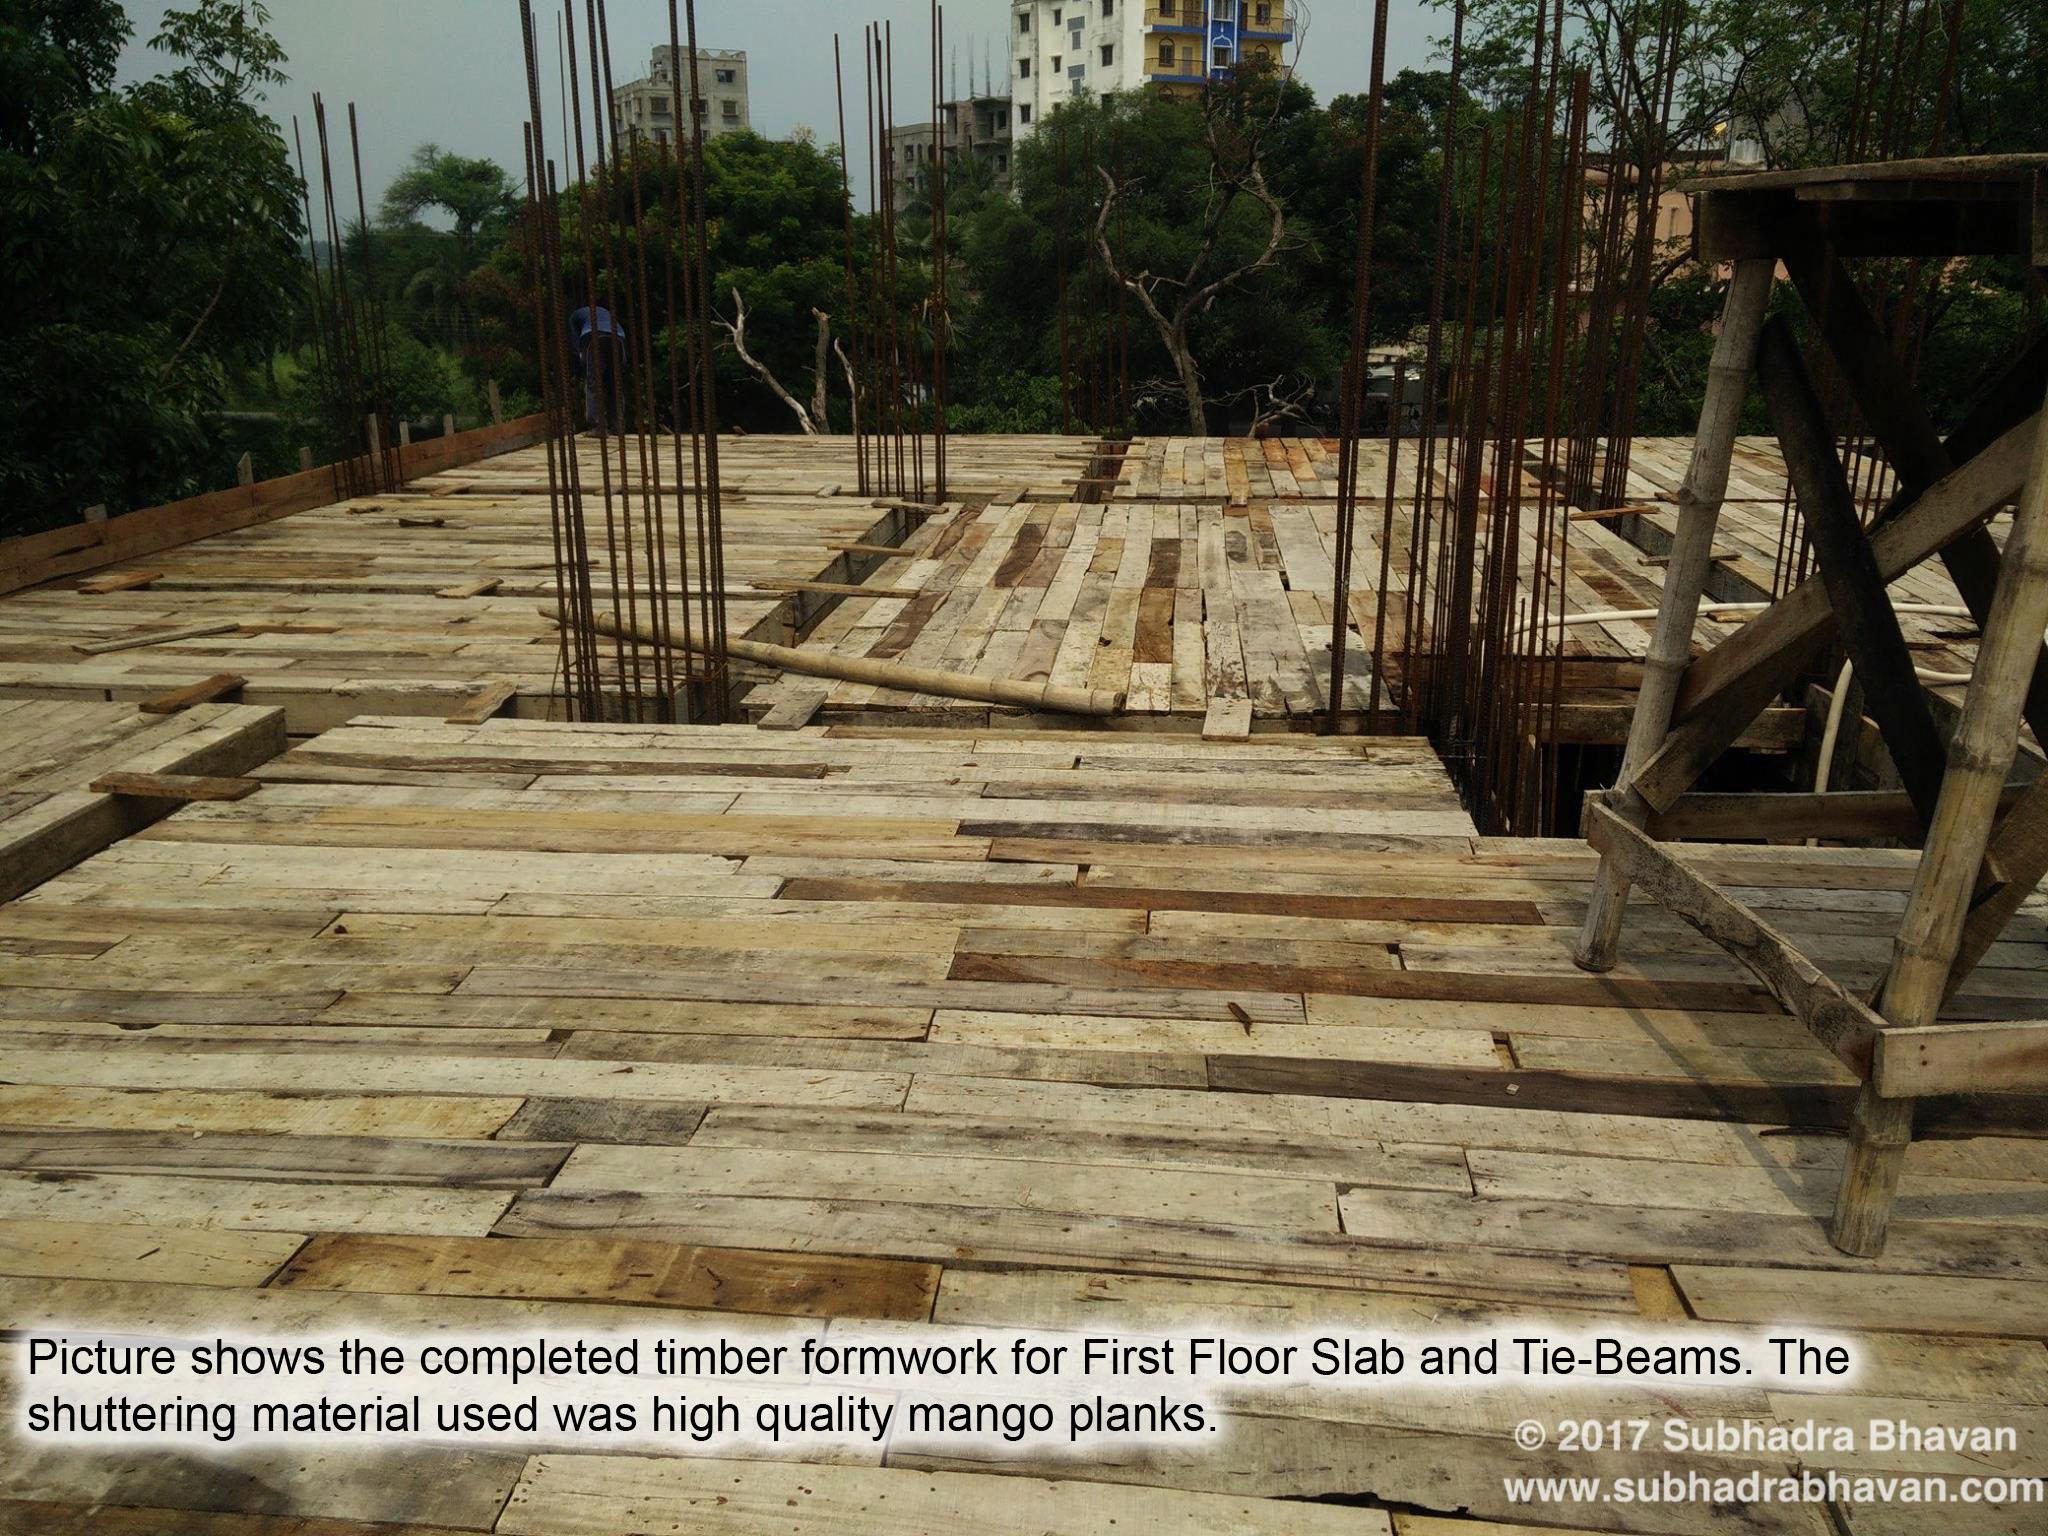 Subhadra Bhavan - Construction of Deep Pile Foundation in